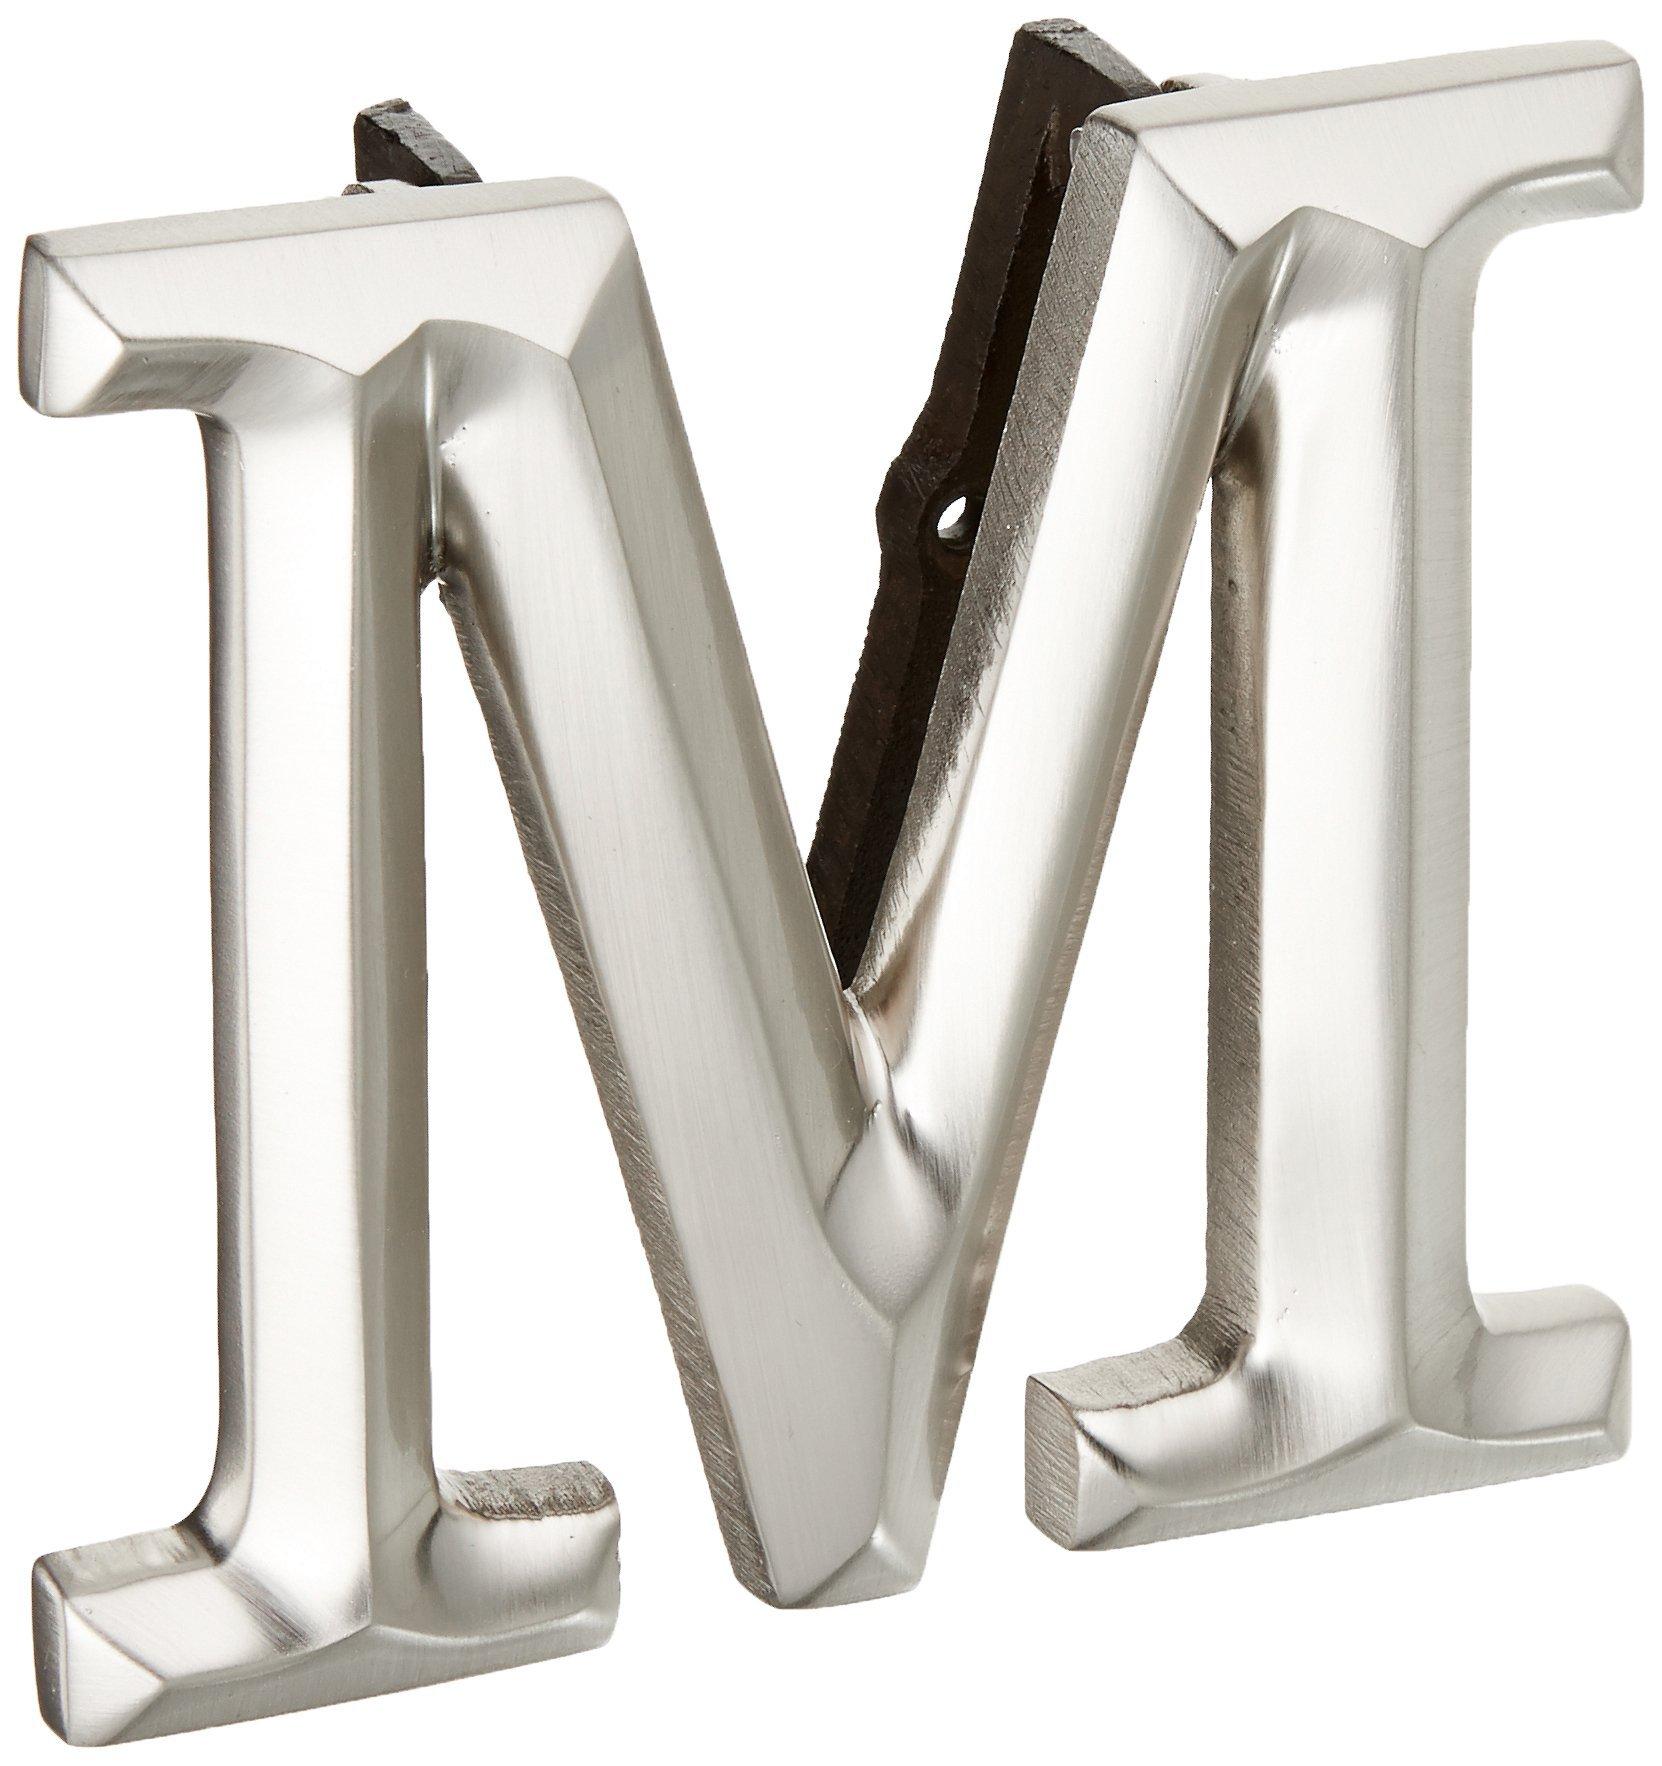 Monogram Letter M Door Knocker - Nickel Silver